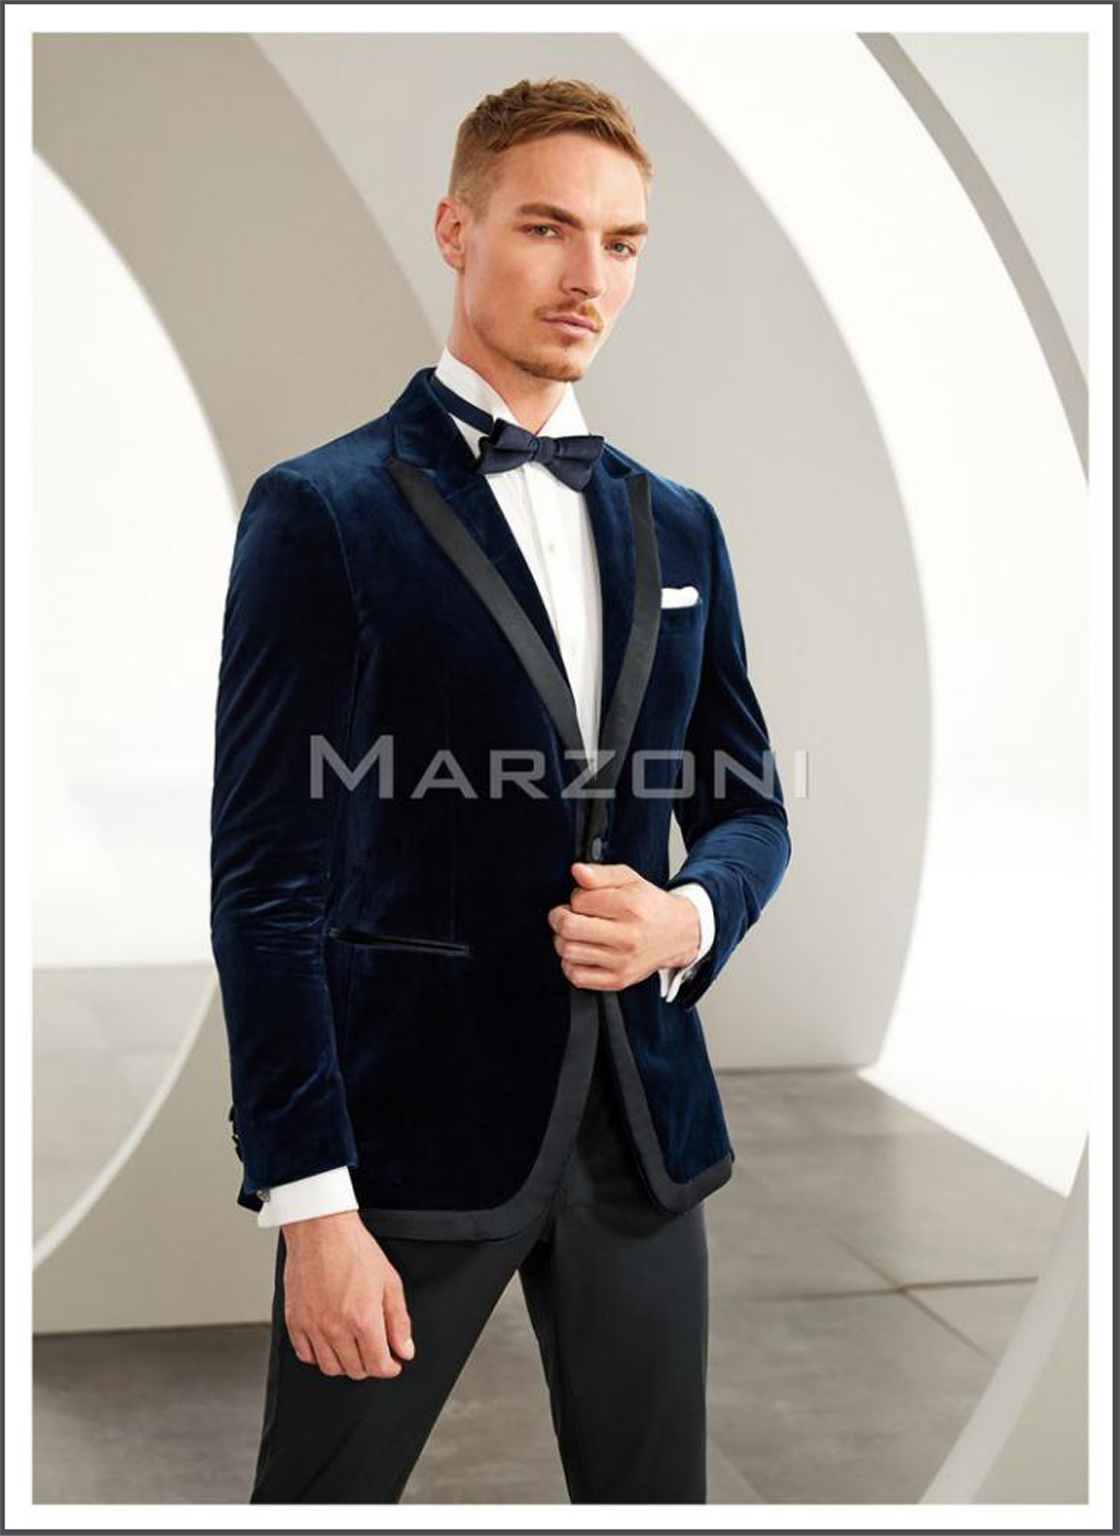 Custom marzoni mens suit velvet satin dress palace style high class handmade suit banquet